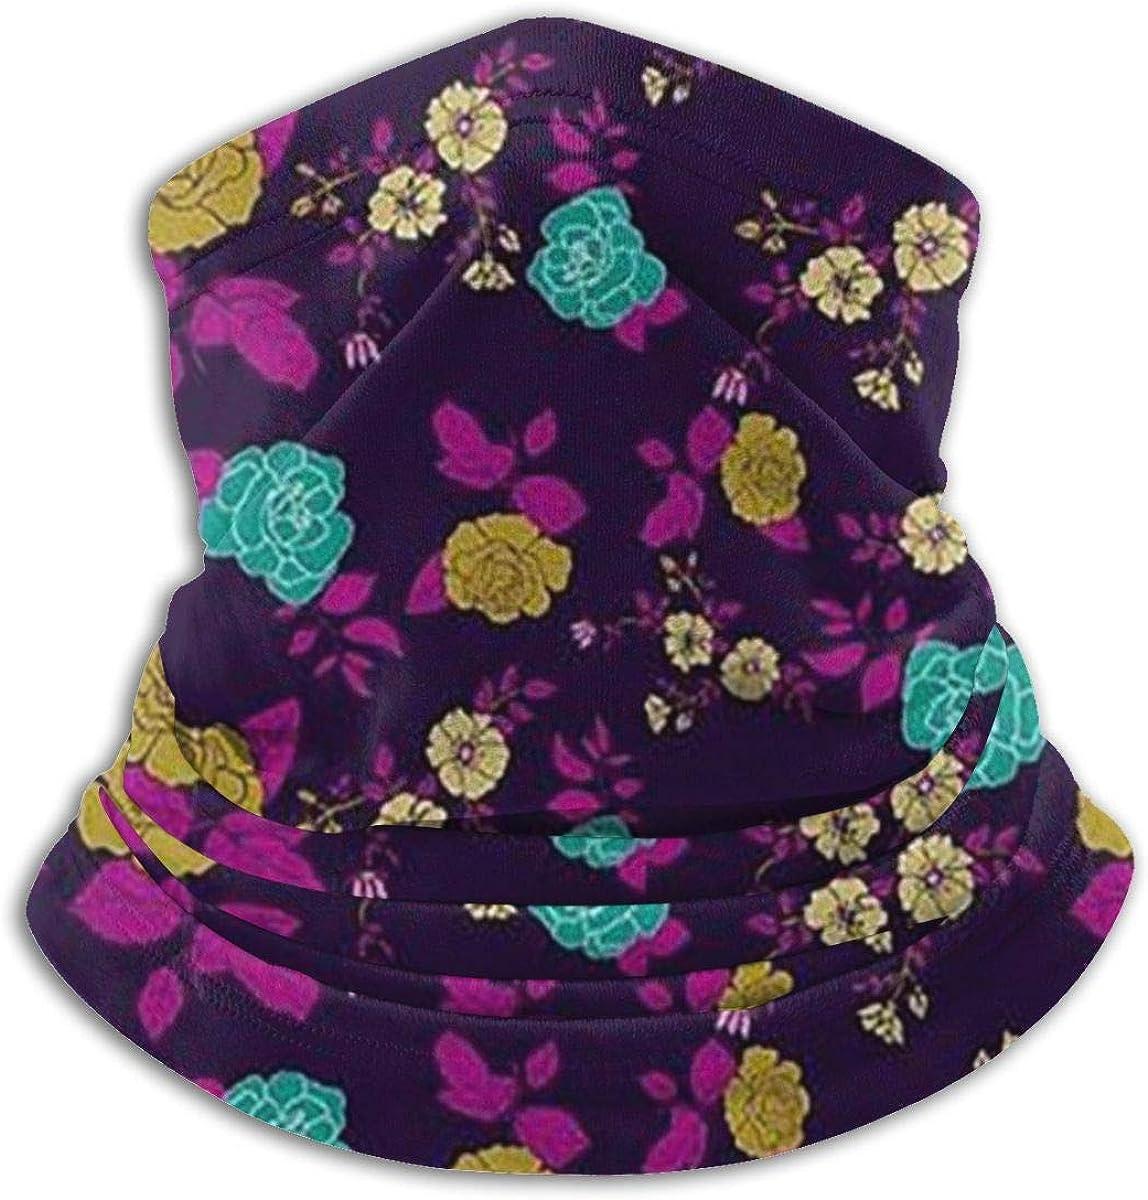 Summer Floral Black Multi-function Neck Warmer Gaiter Polyester Neck Warmer Windproof Winter Neck Gaiter Cold Weather Scarf For Men Women